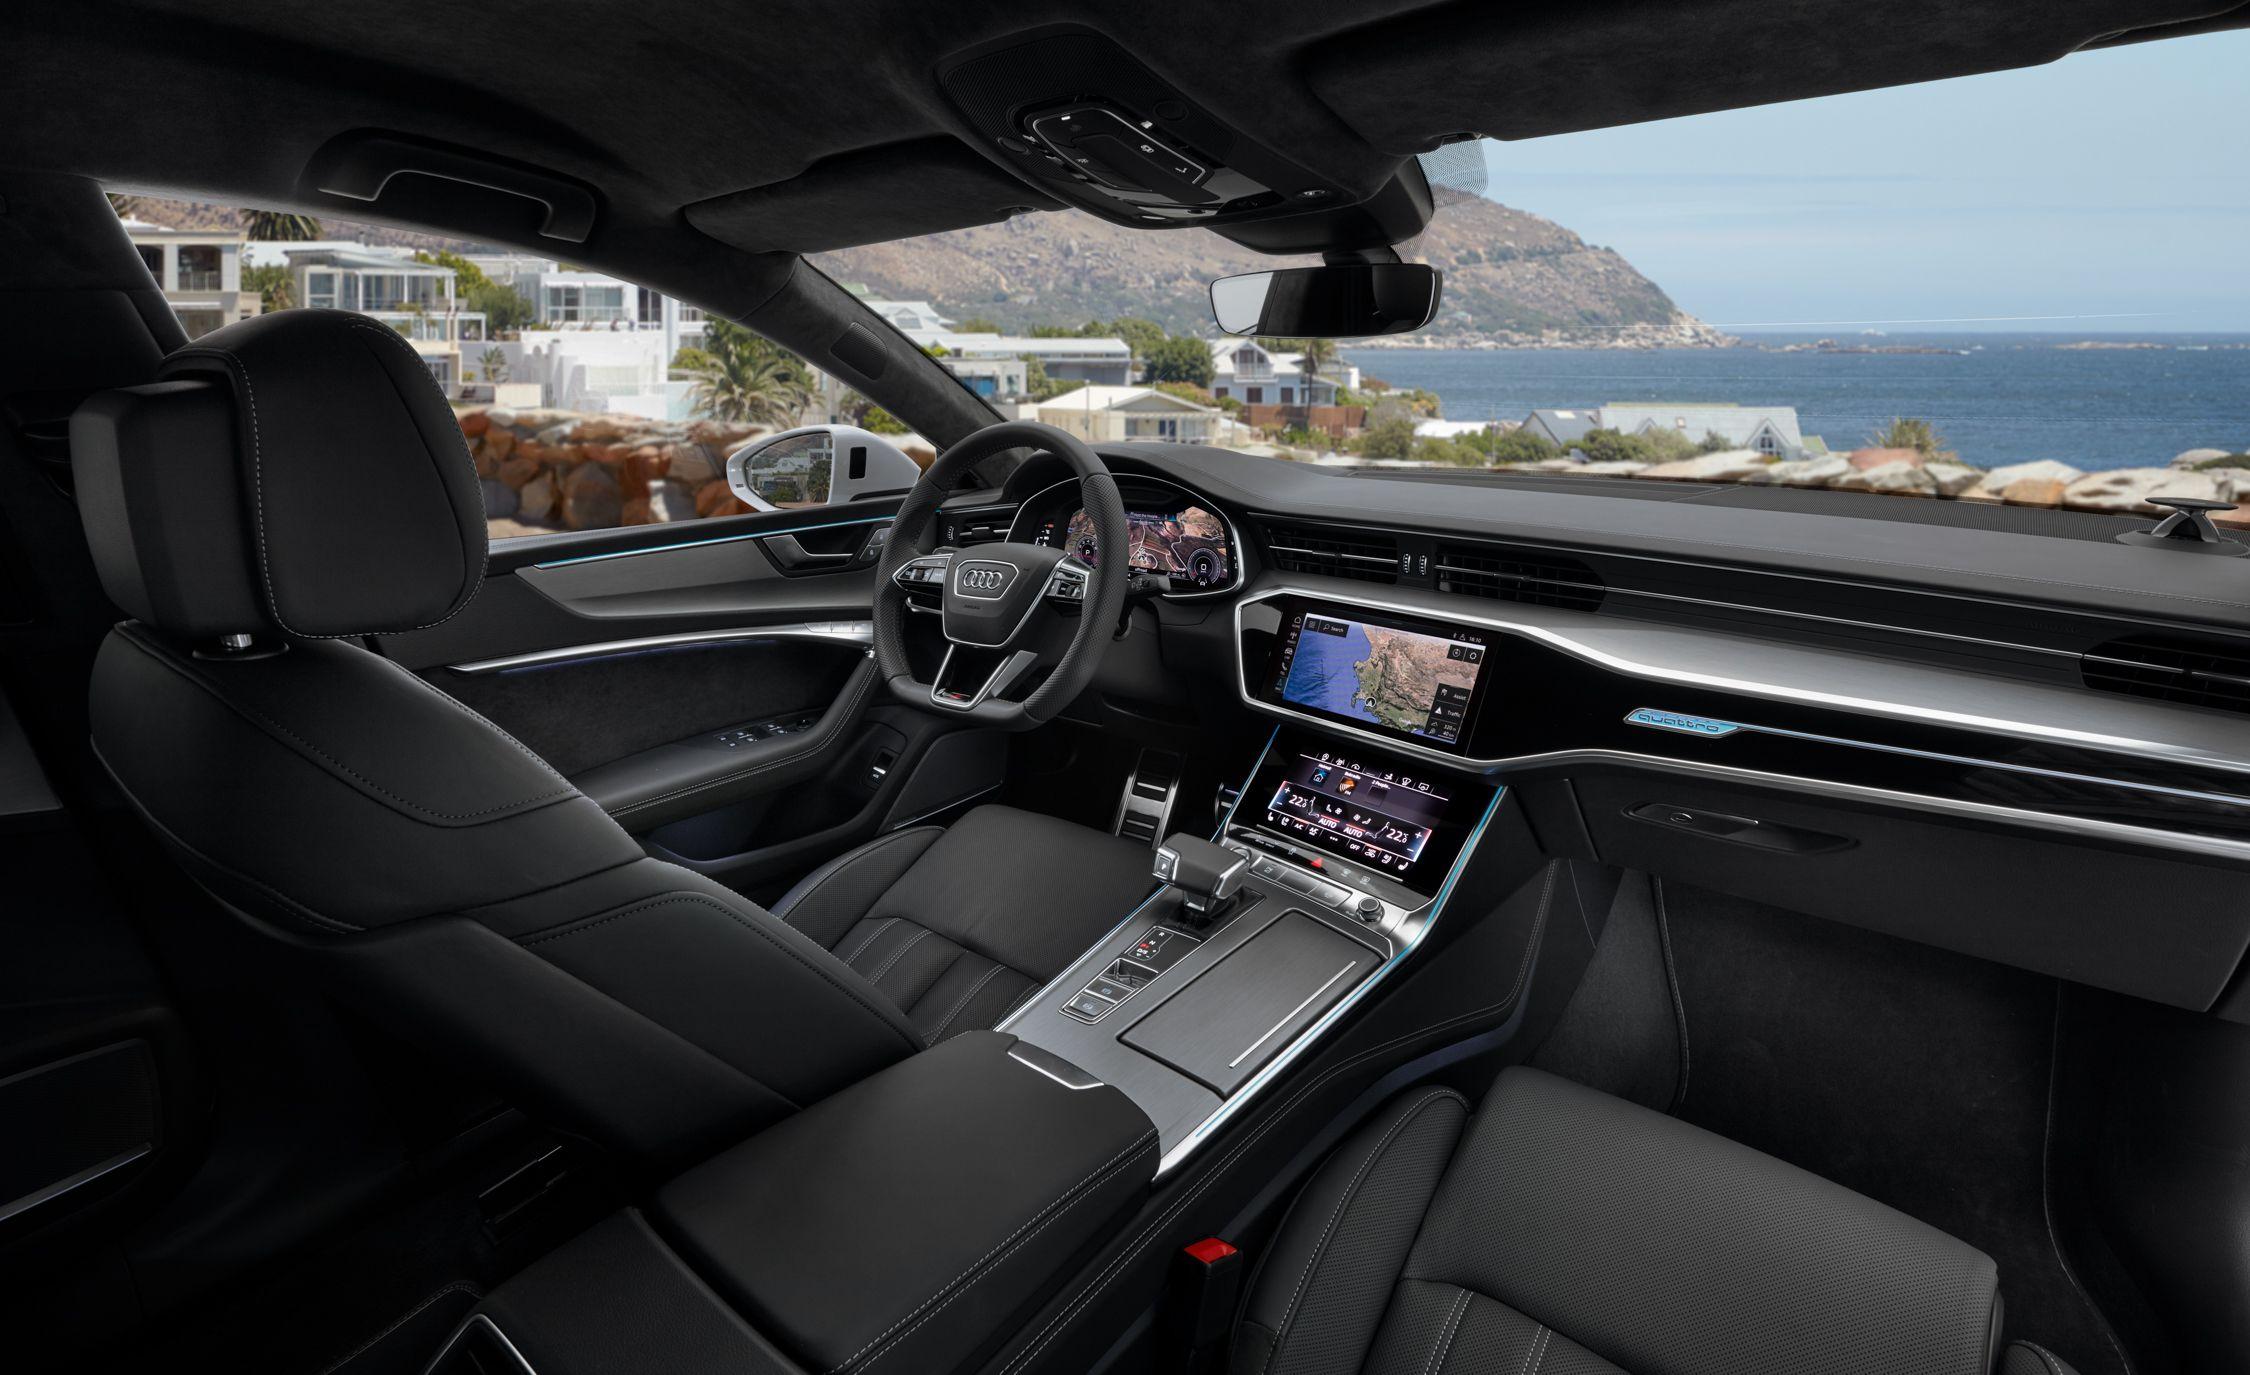 2019-Audi-A7-Sportback-191-1.jpg